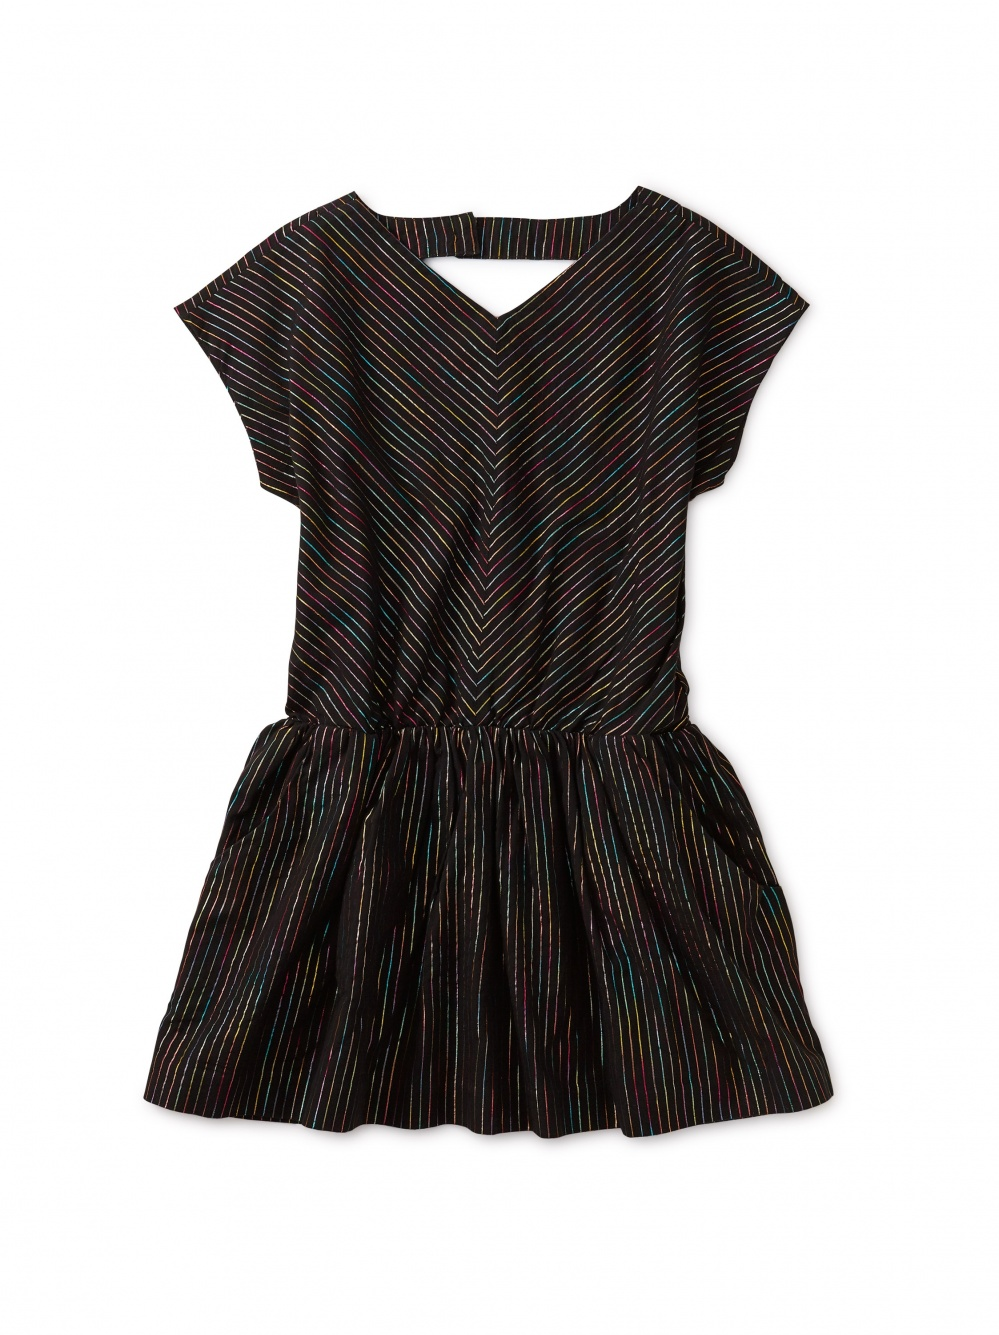 Metallic Rainbow Striped Dress